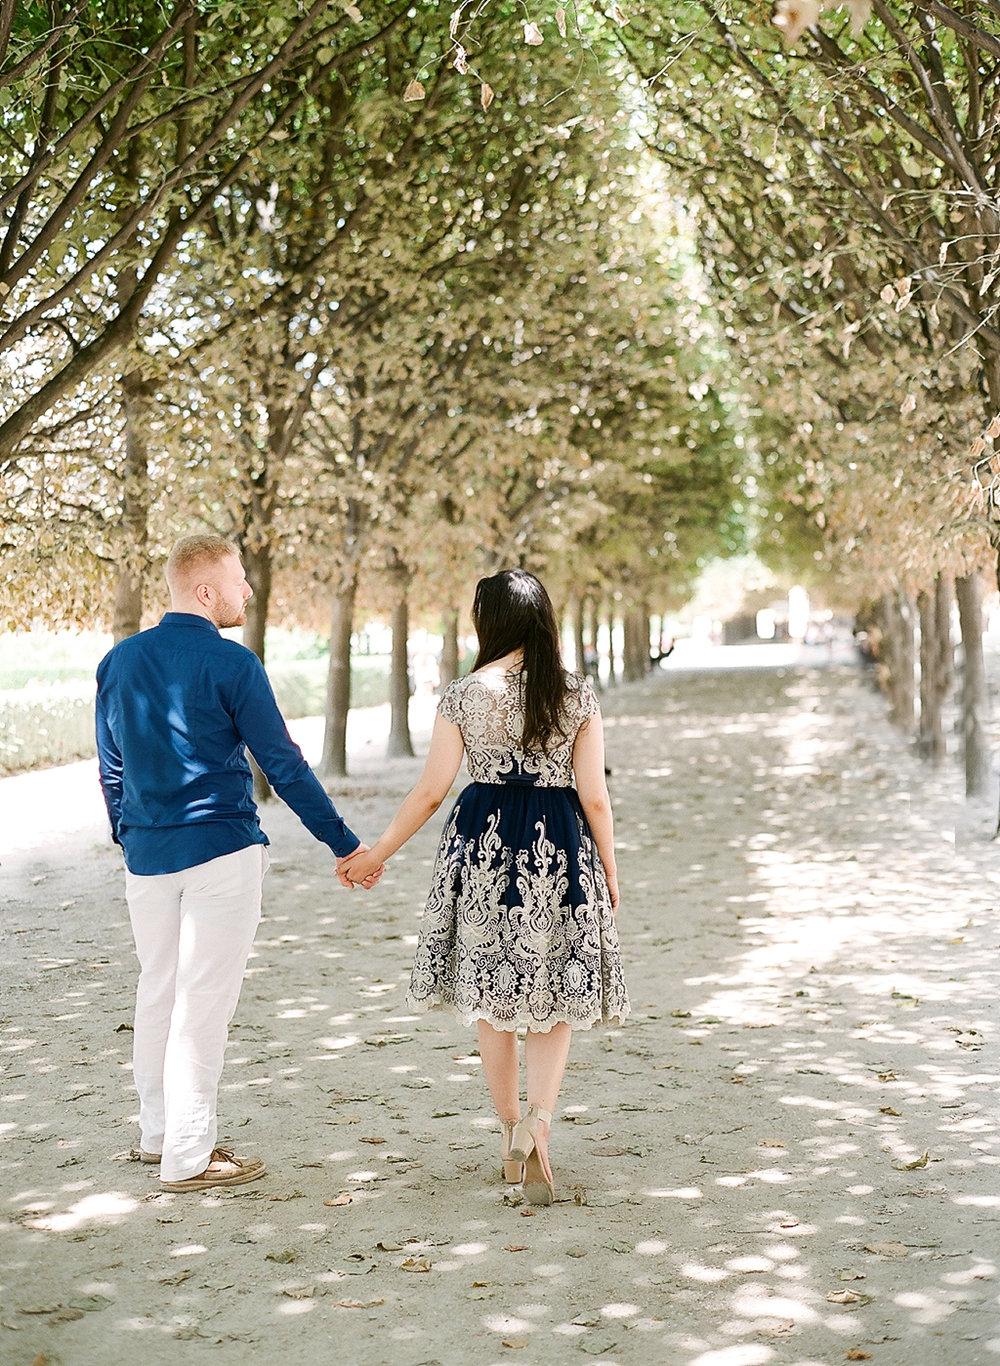 Bonphotage Paris Fine Art Wedding Photography